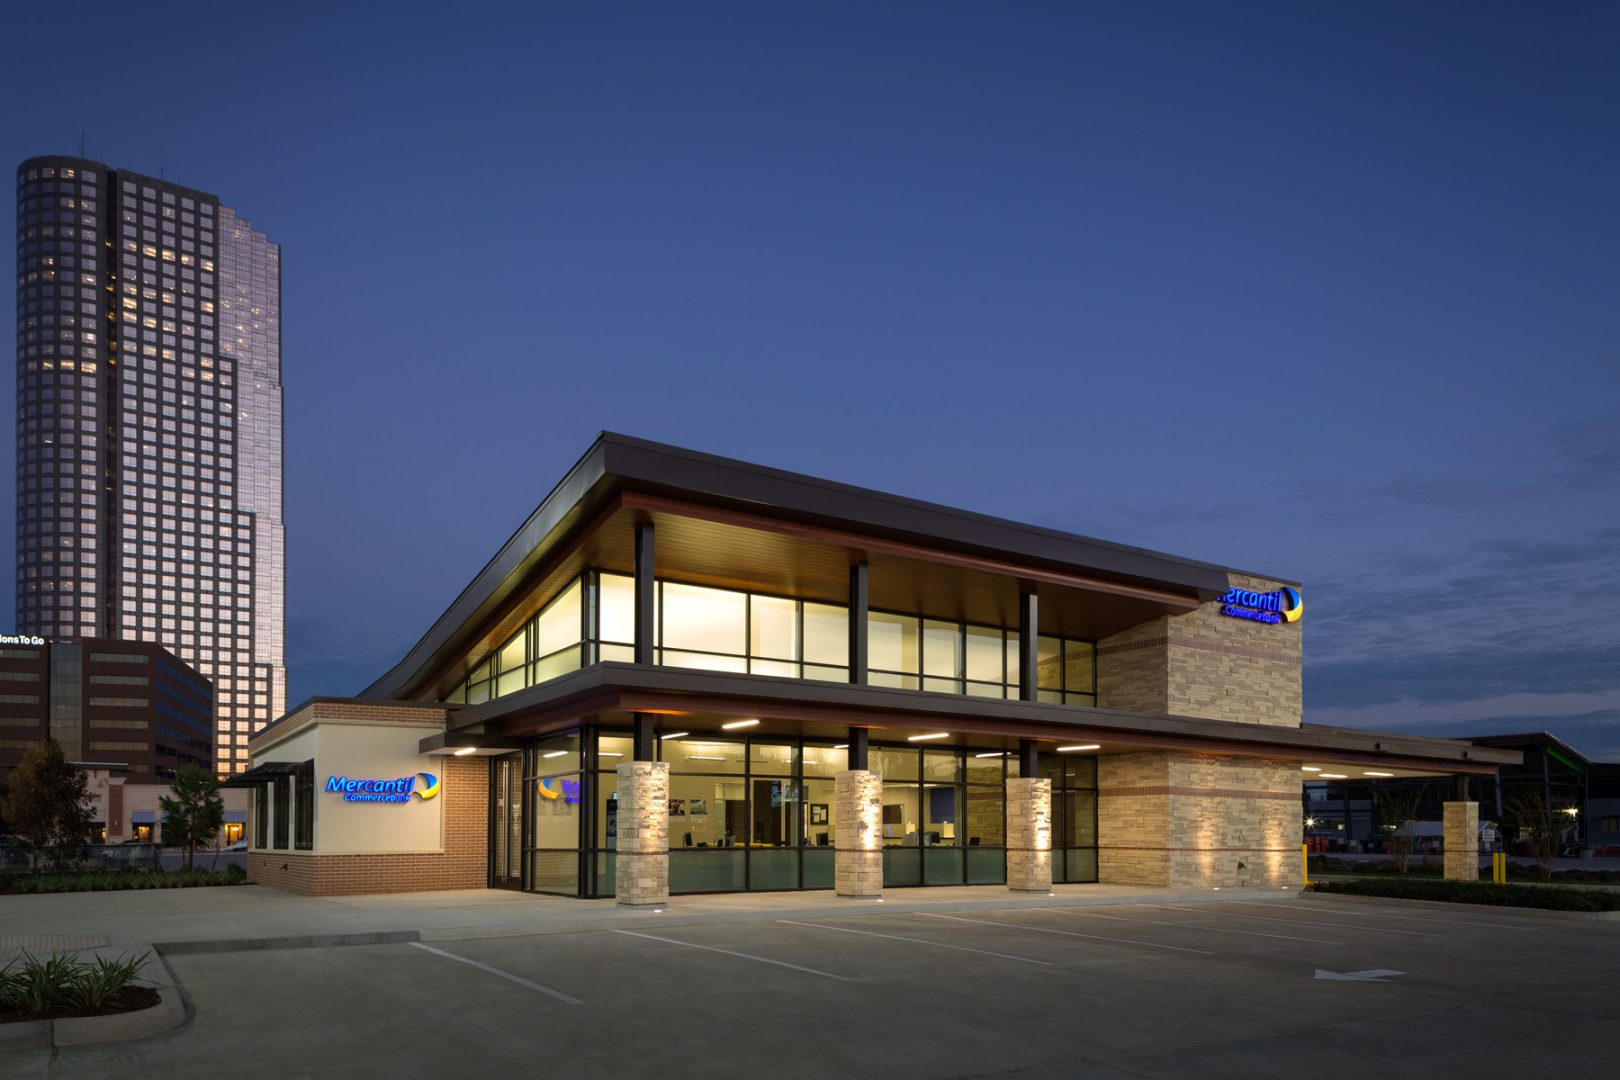 Commercial Financial Retail Design Mercantil Commercebank Tanglewood Houston Night Facade